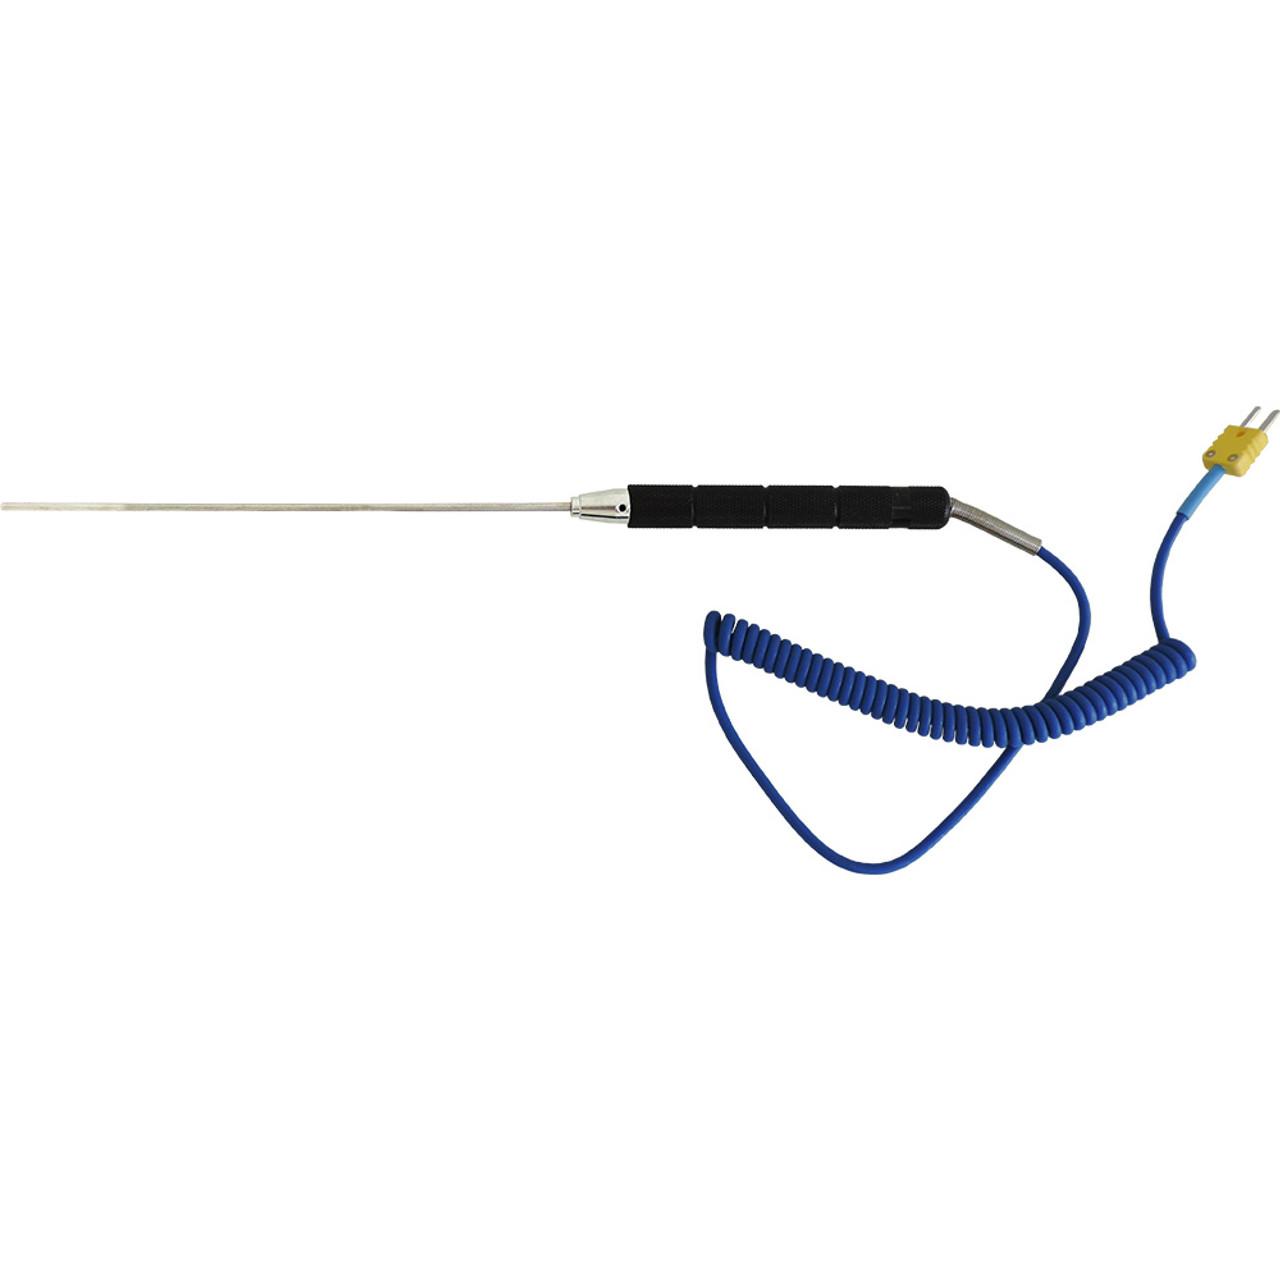 PSP-30BL Temperature Probe - Blunt Rod